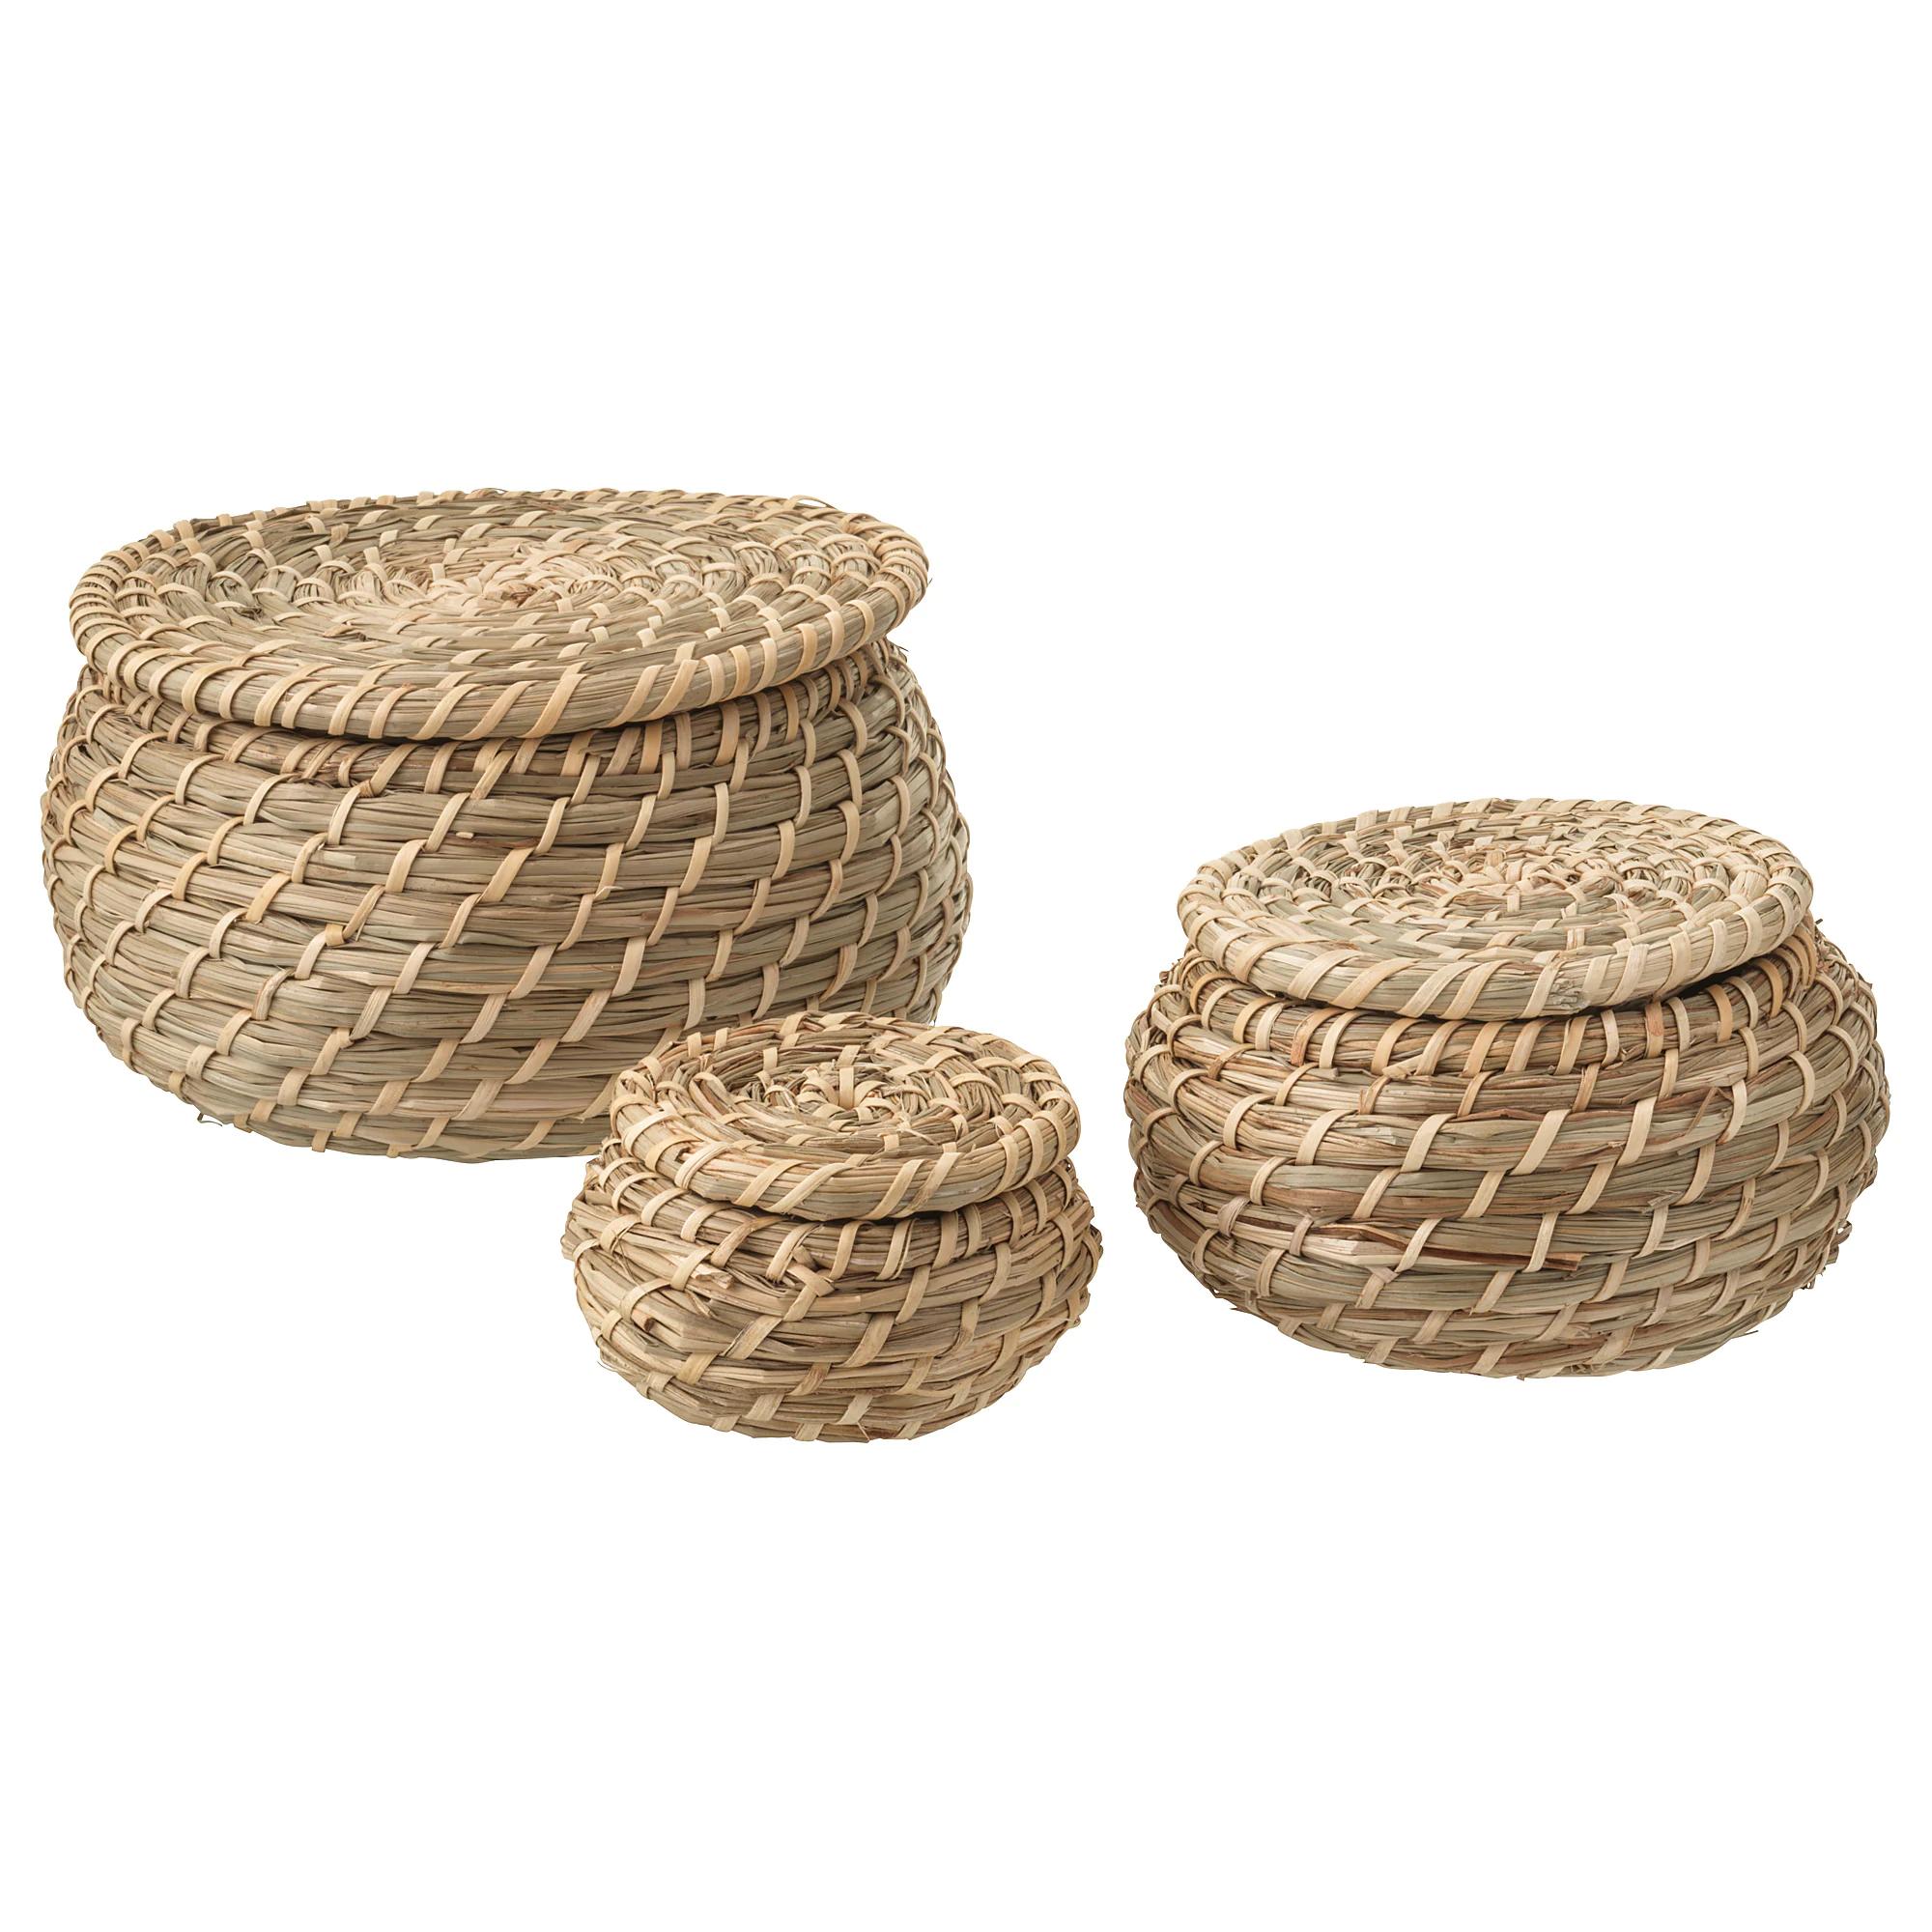 Copy of Woven Decor Basket